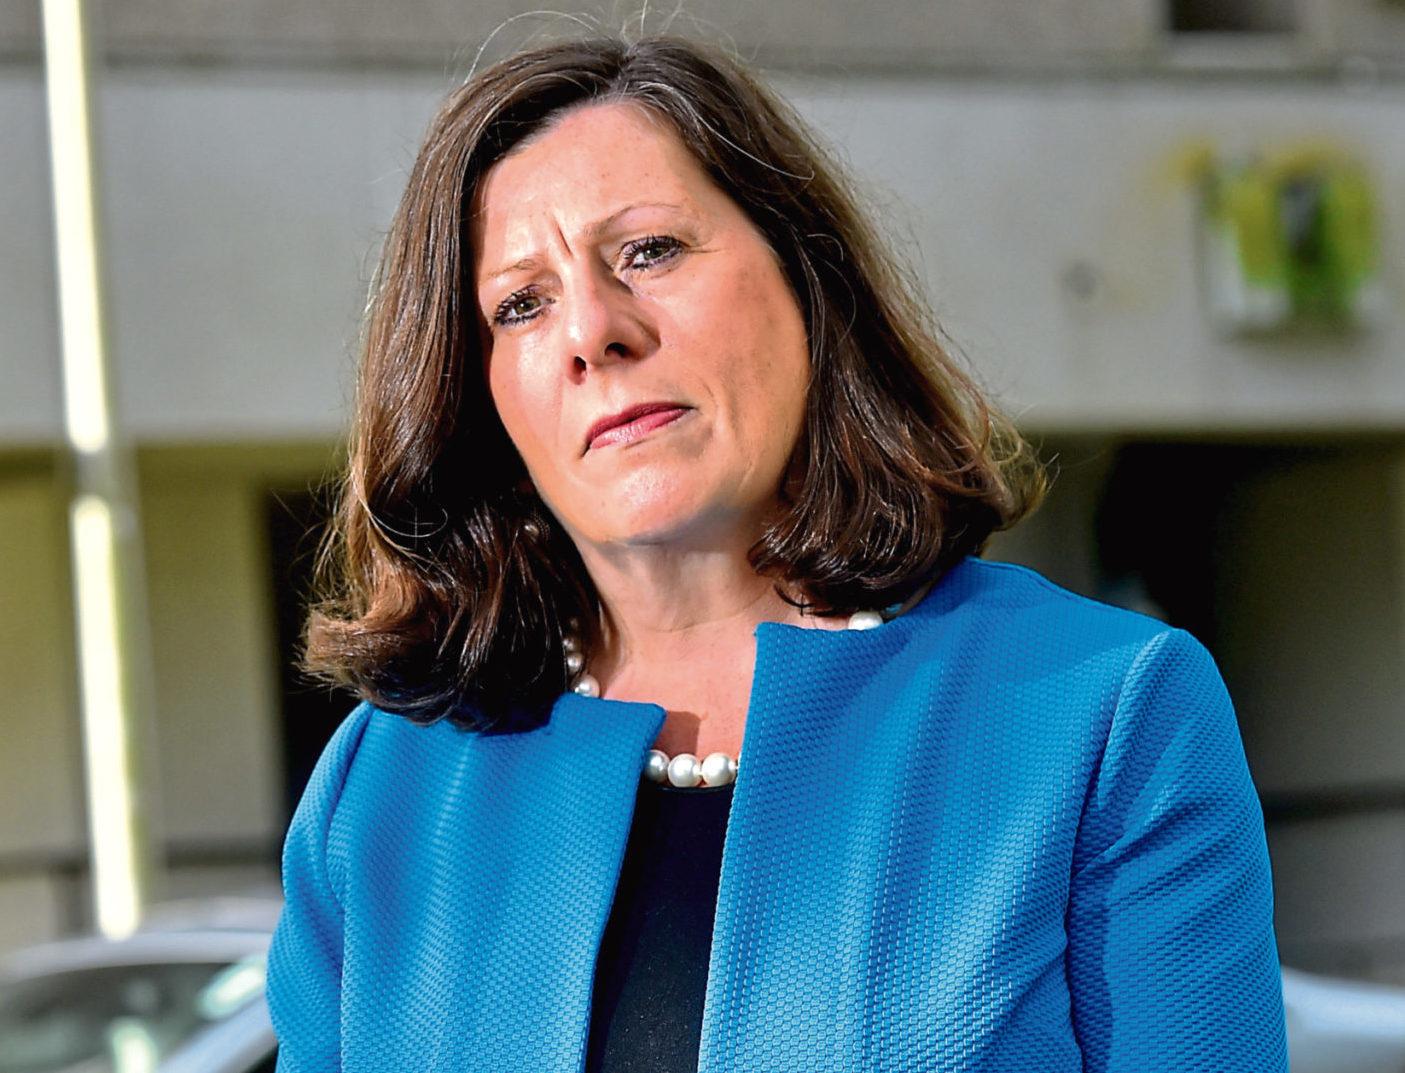 Depute Provost Jennifer Stewart